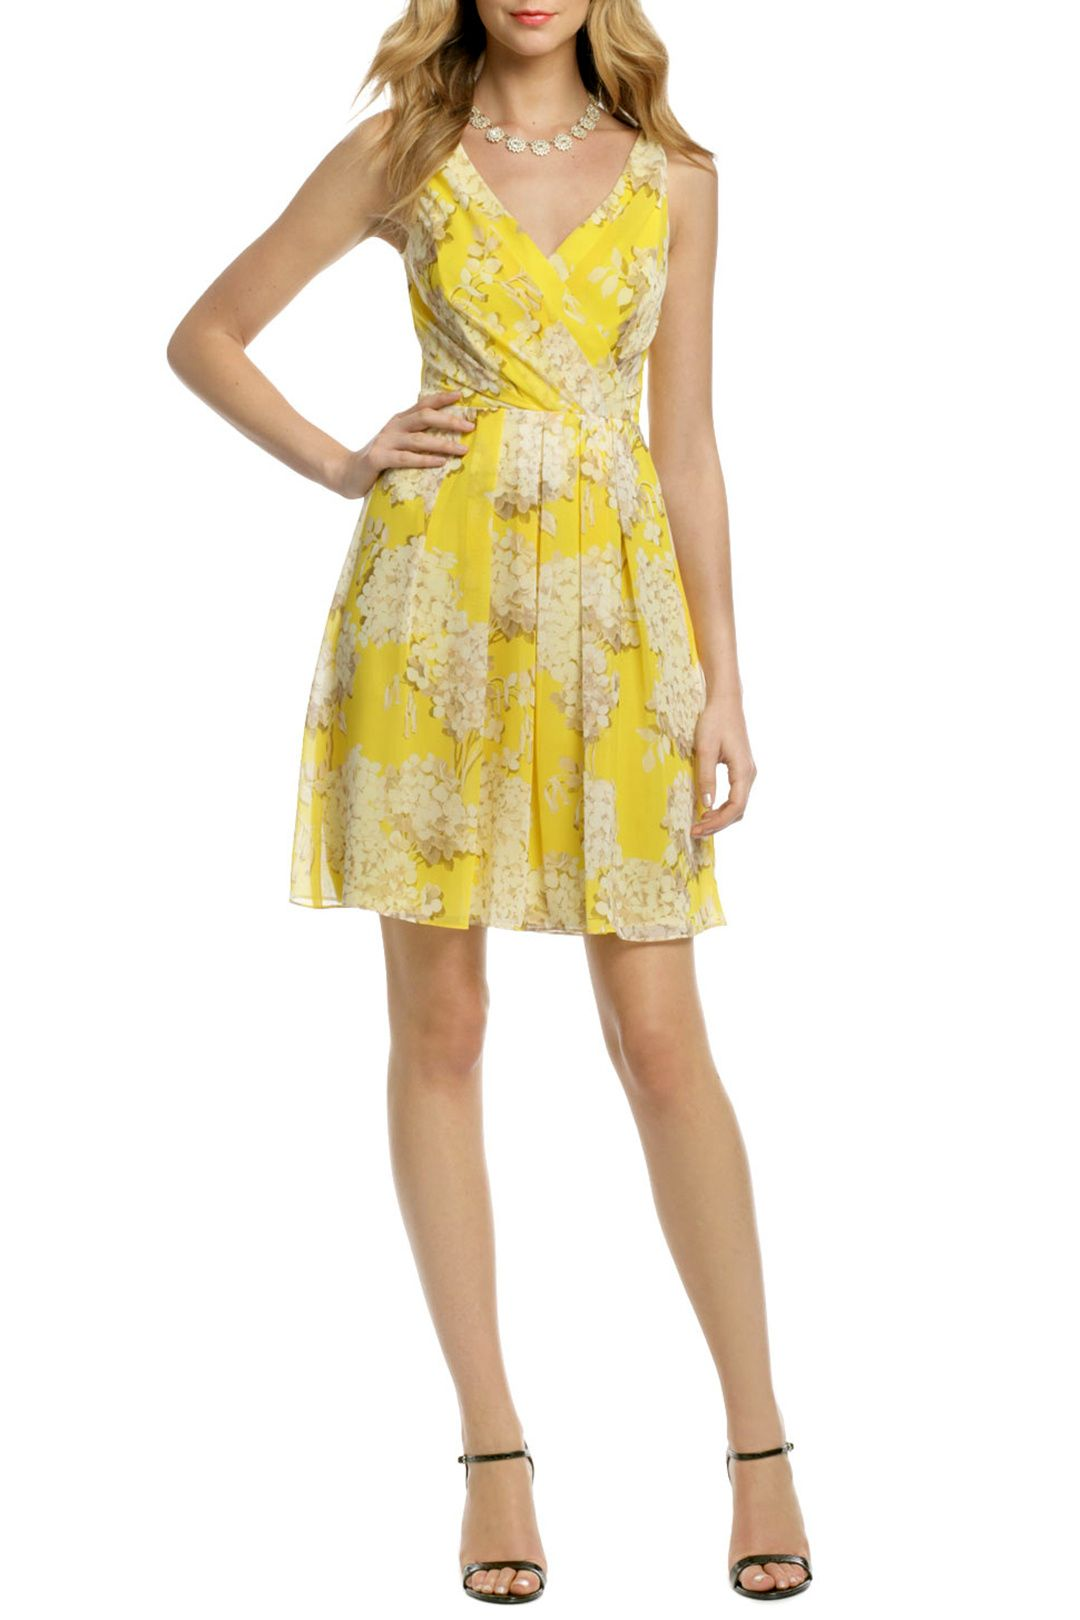 Canary Hydrangea Dress | Trina turk, Hydrangea and Mob dresses